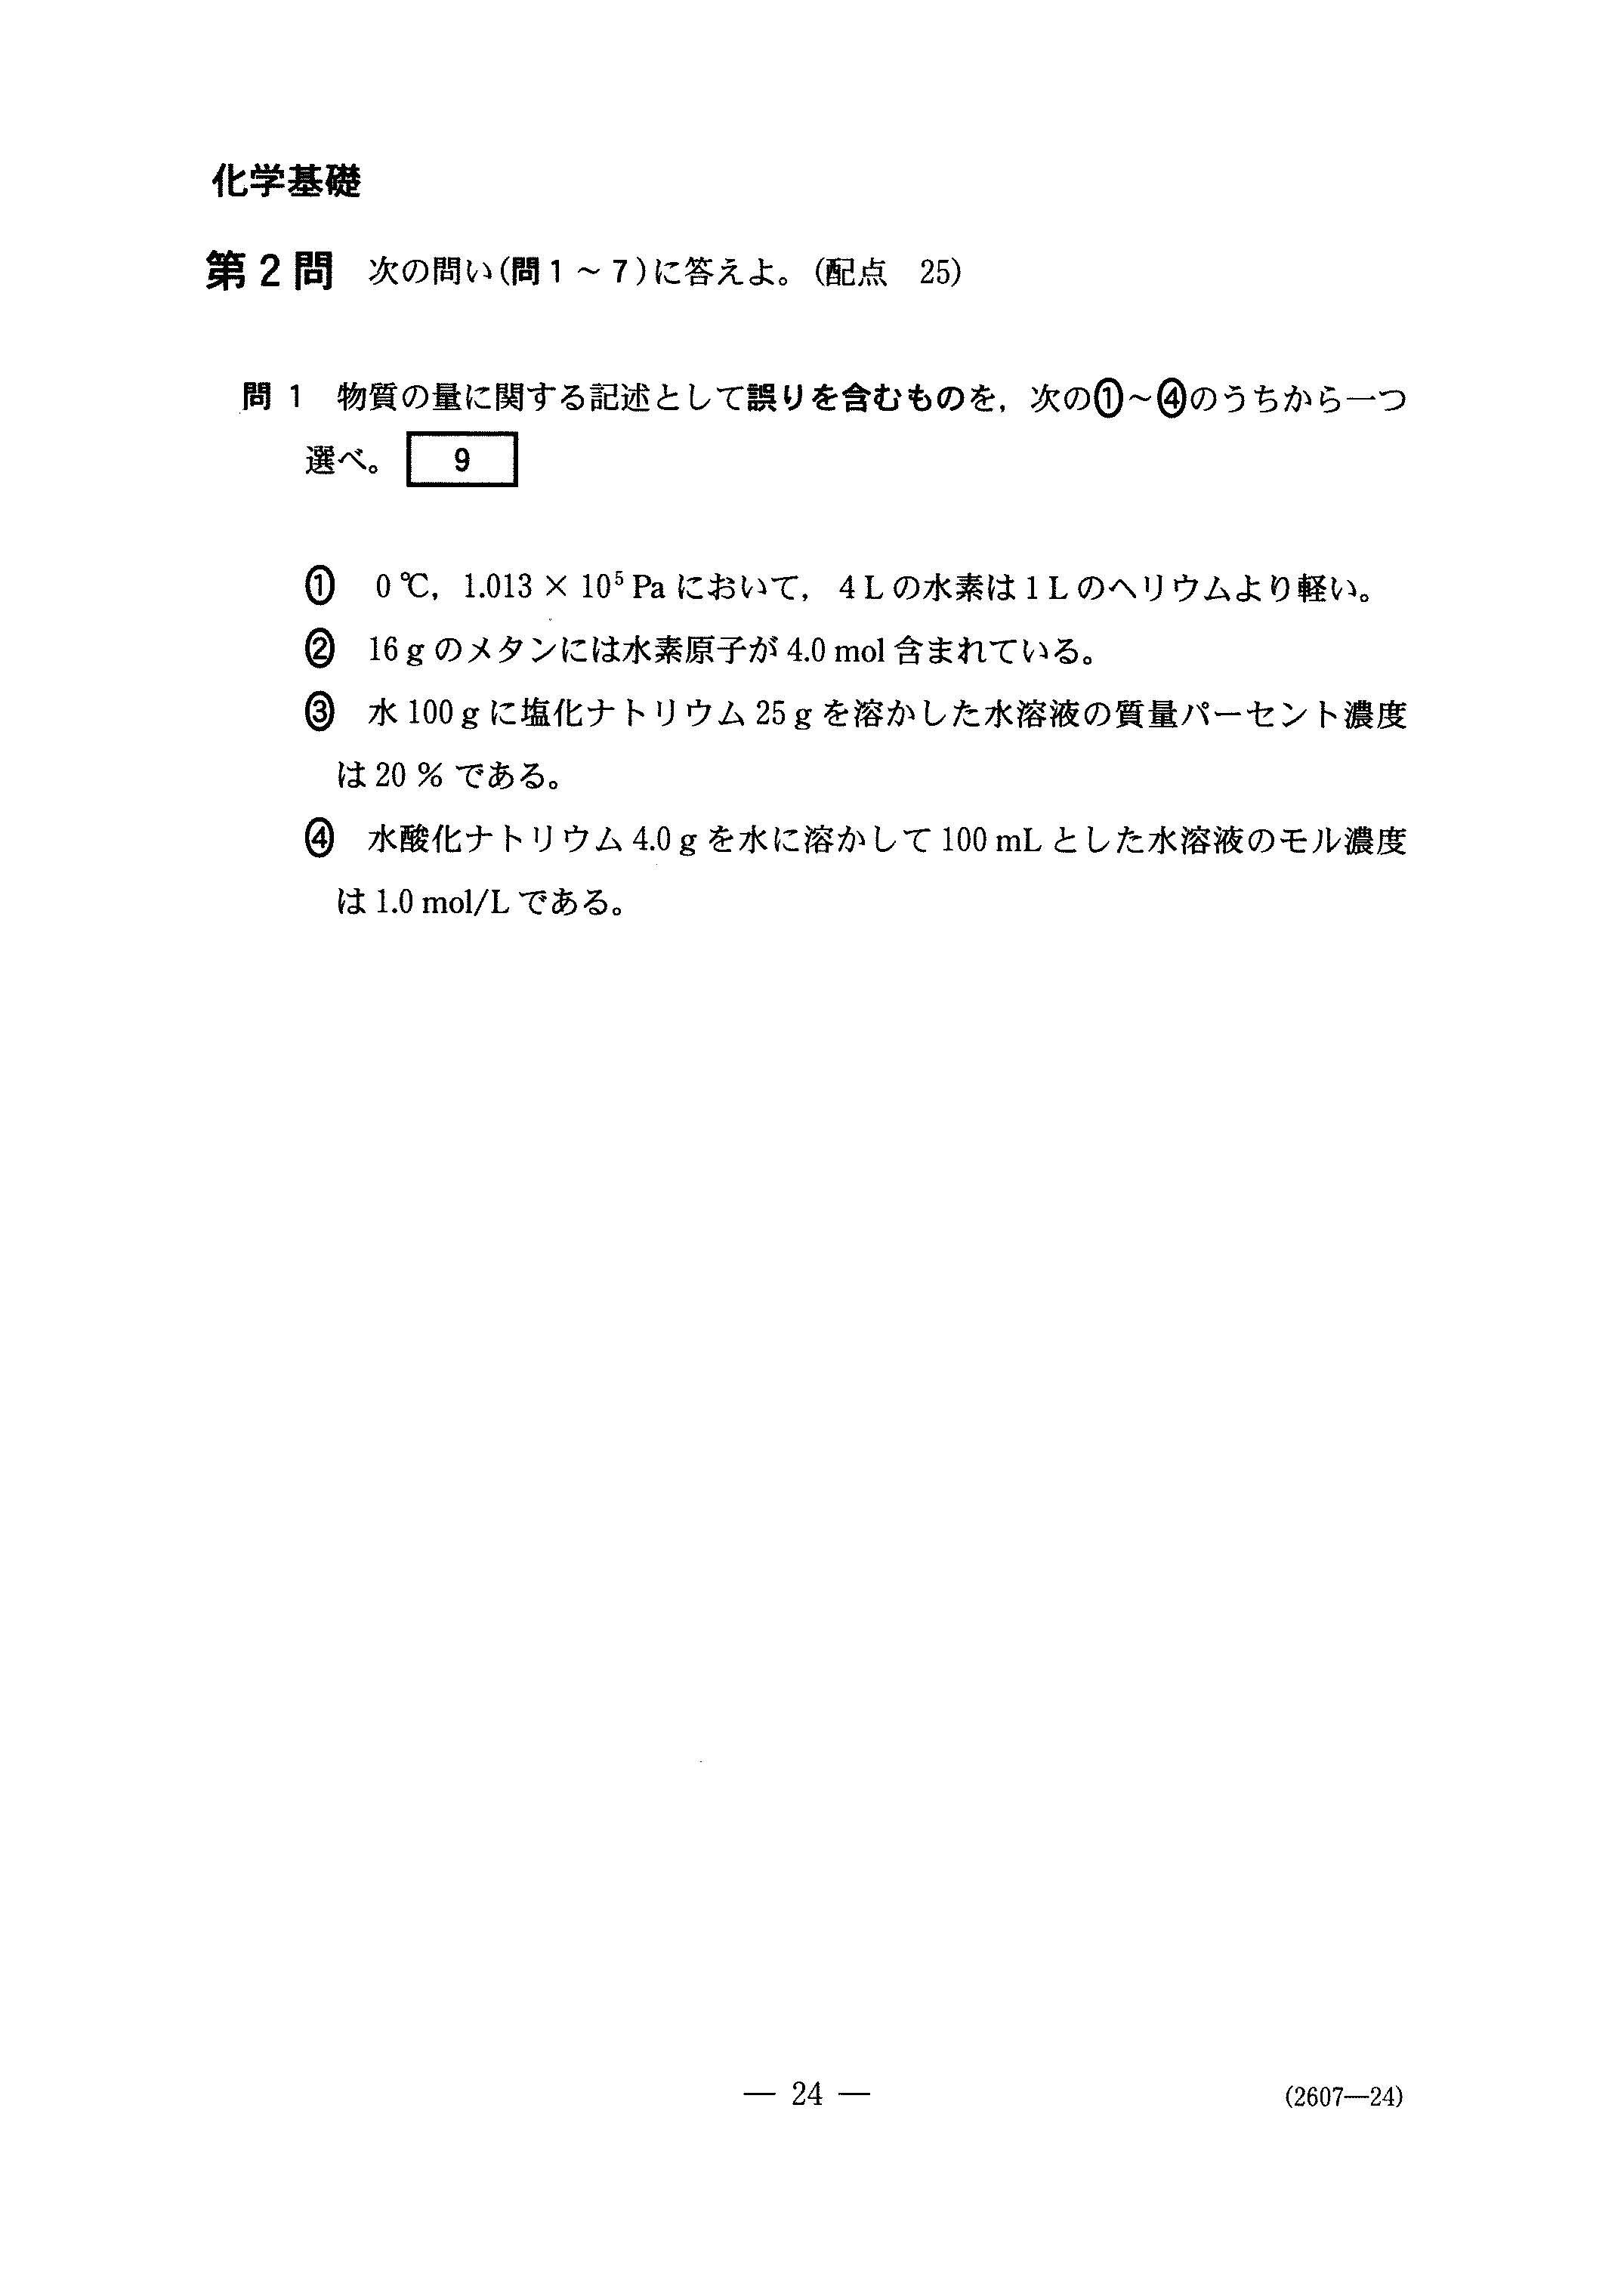 H29理科_化学基礎 大学入試センター試験過去問